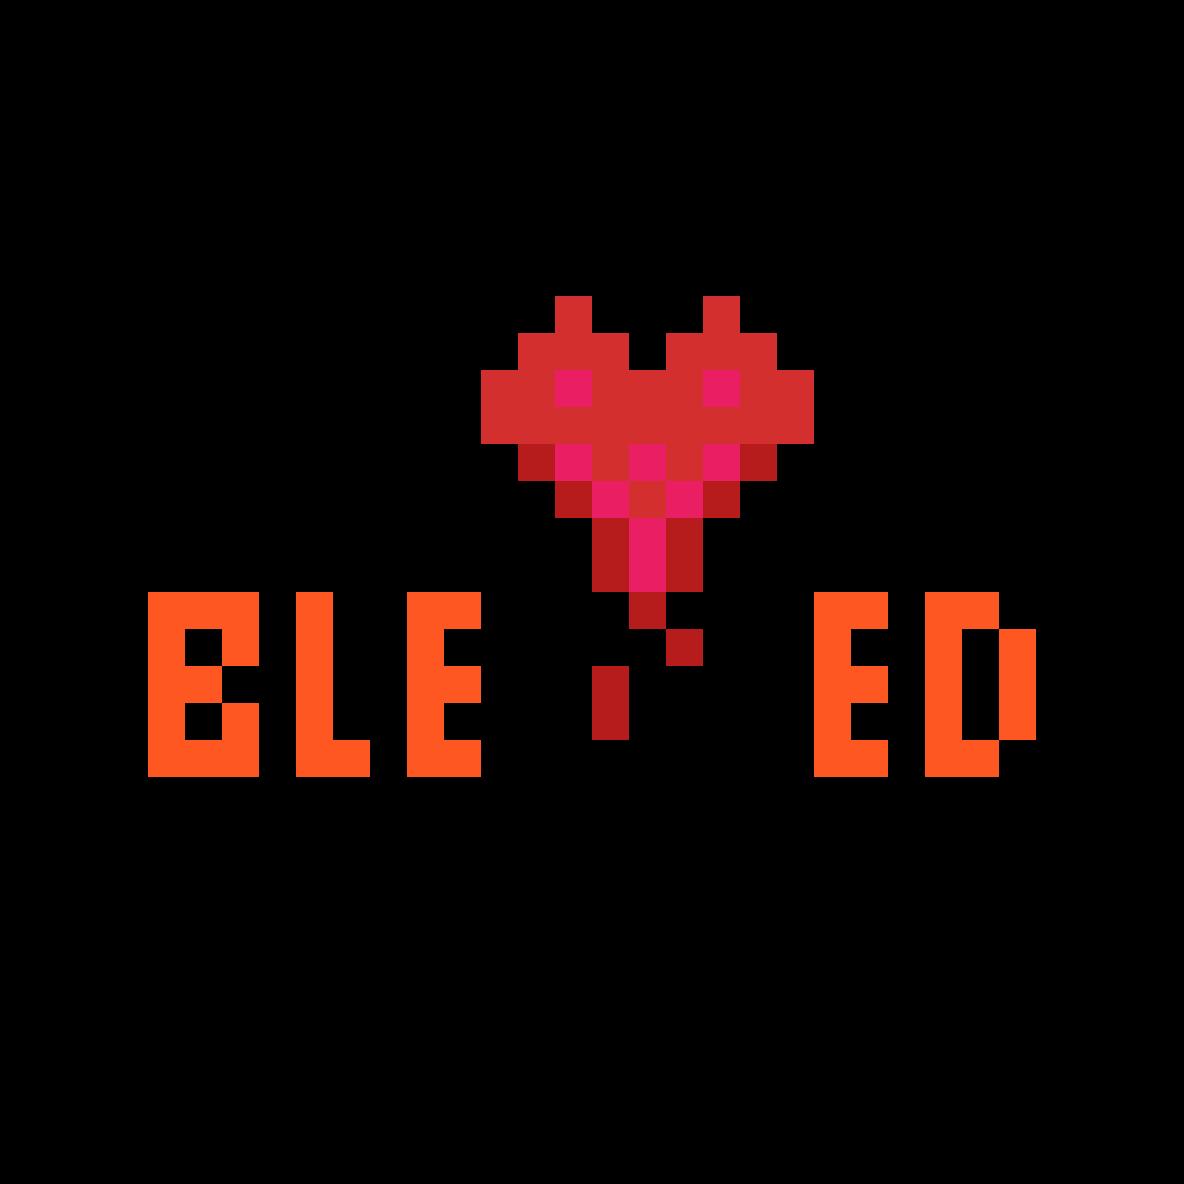 Bleed heart by animatesam